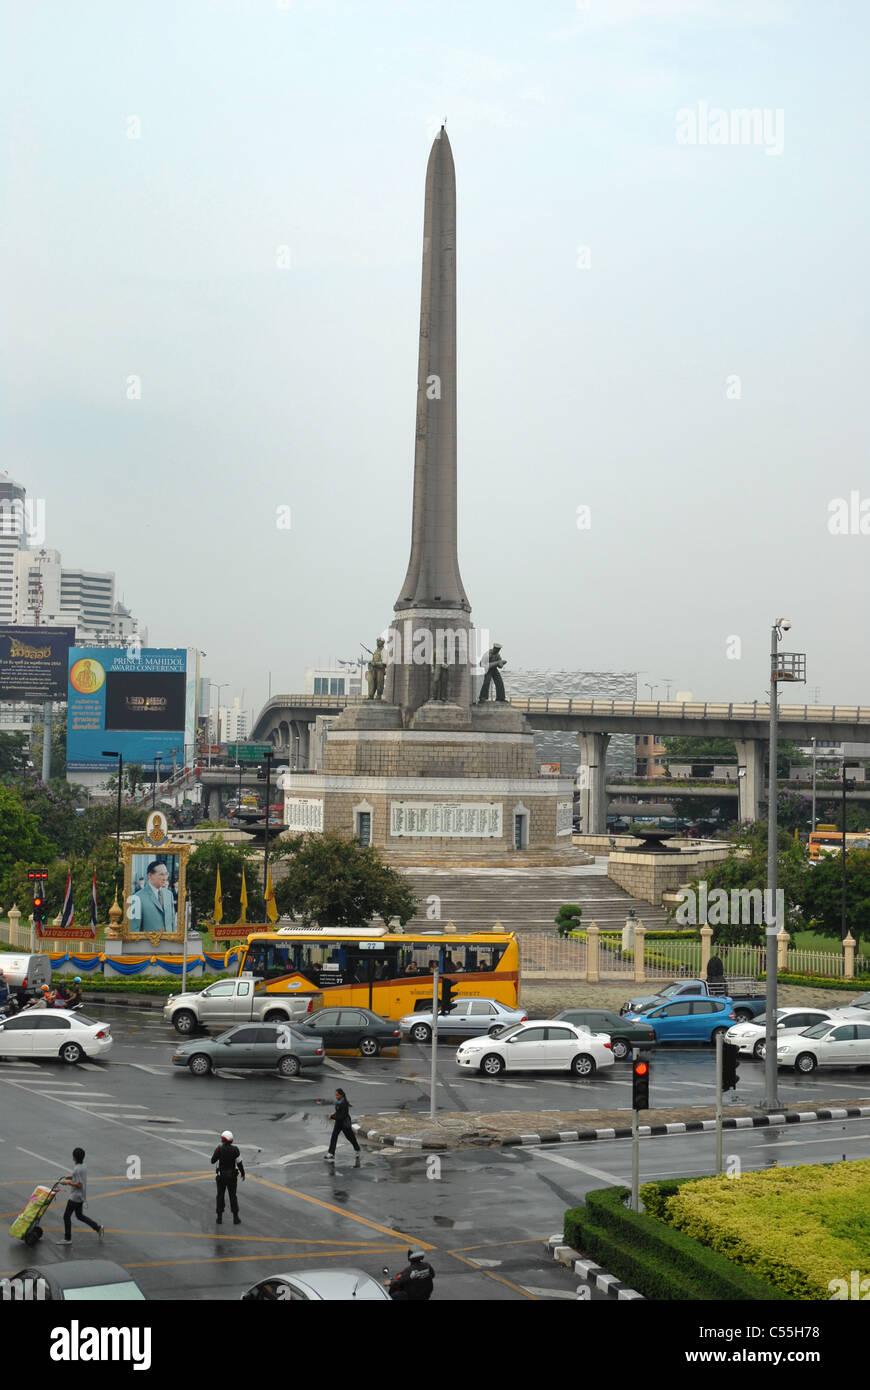 9efc2e6155 Bangkok Victory Monument Thailand Stock Photo  37617308 - Alamy